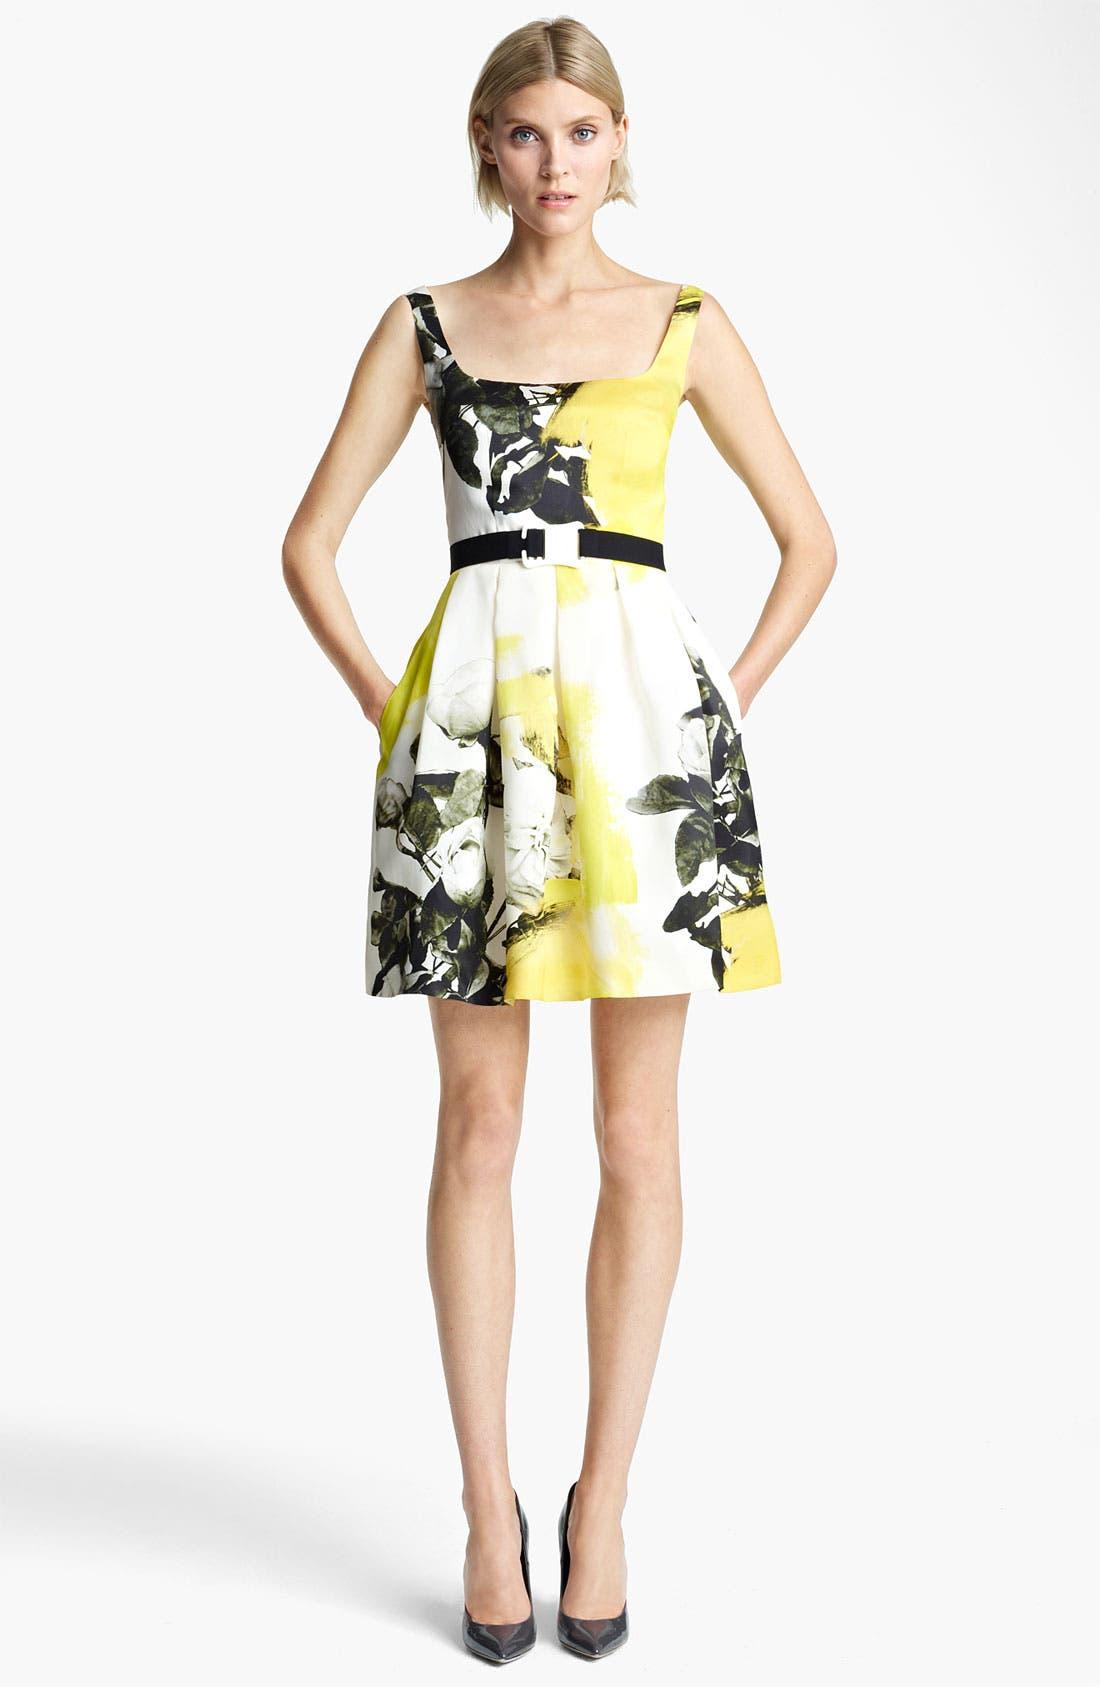 Main Image - Christopher Kane Yellow Floral Print Circle Skirt Dress